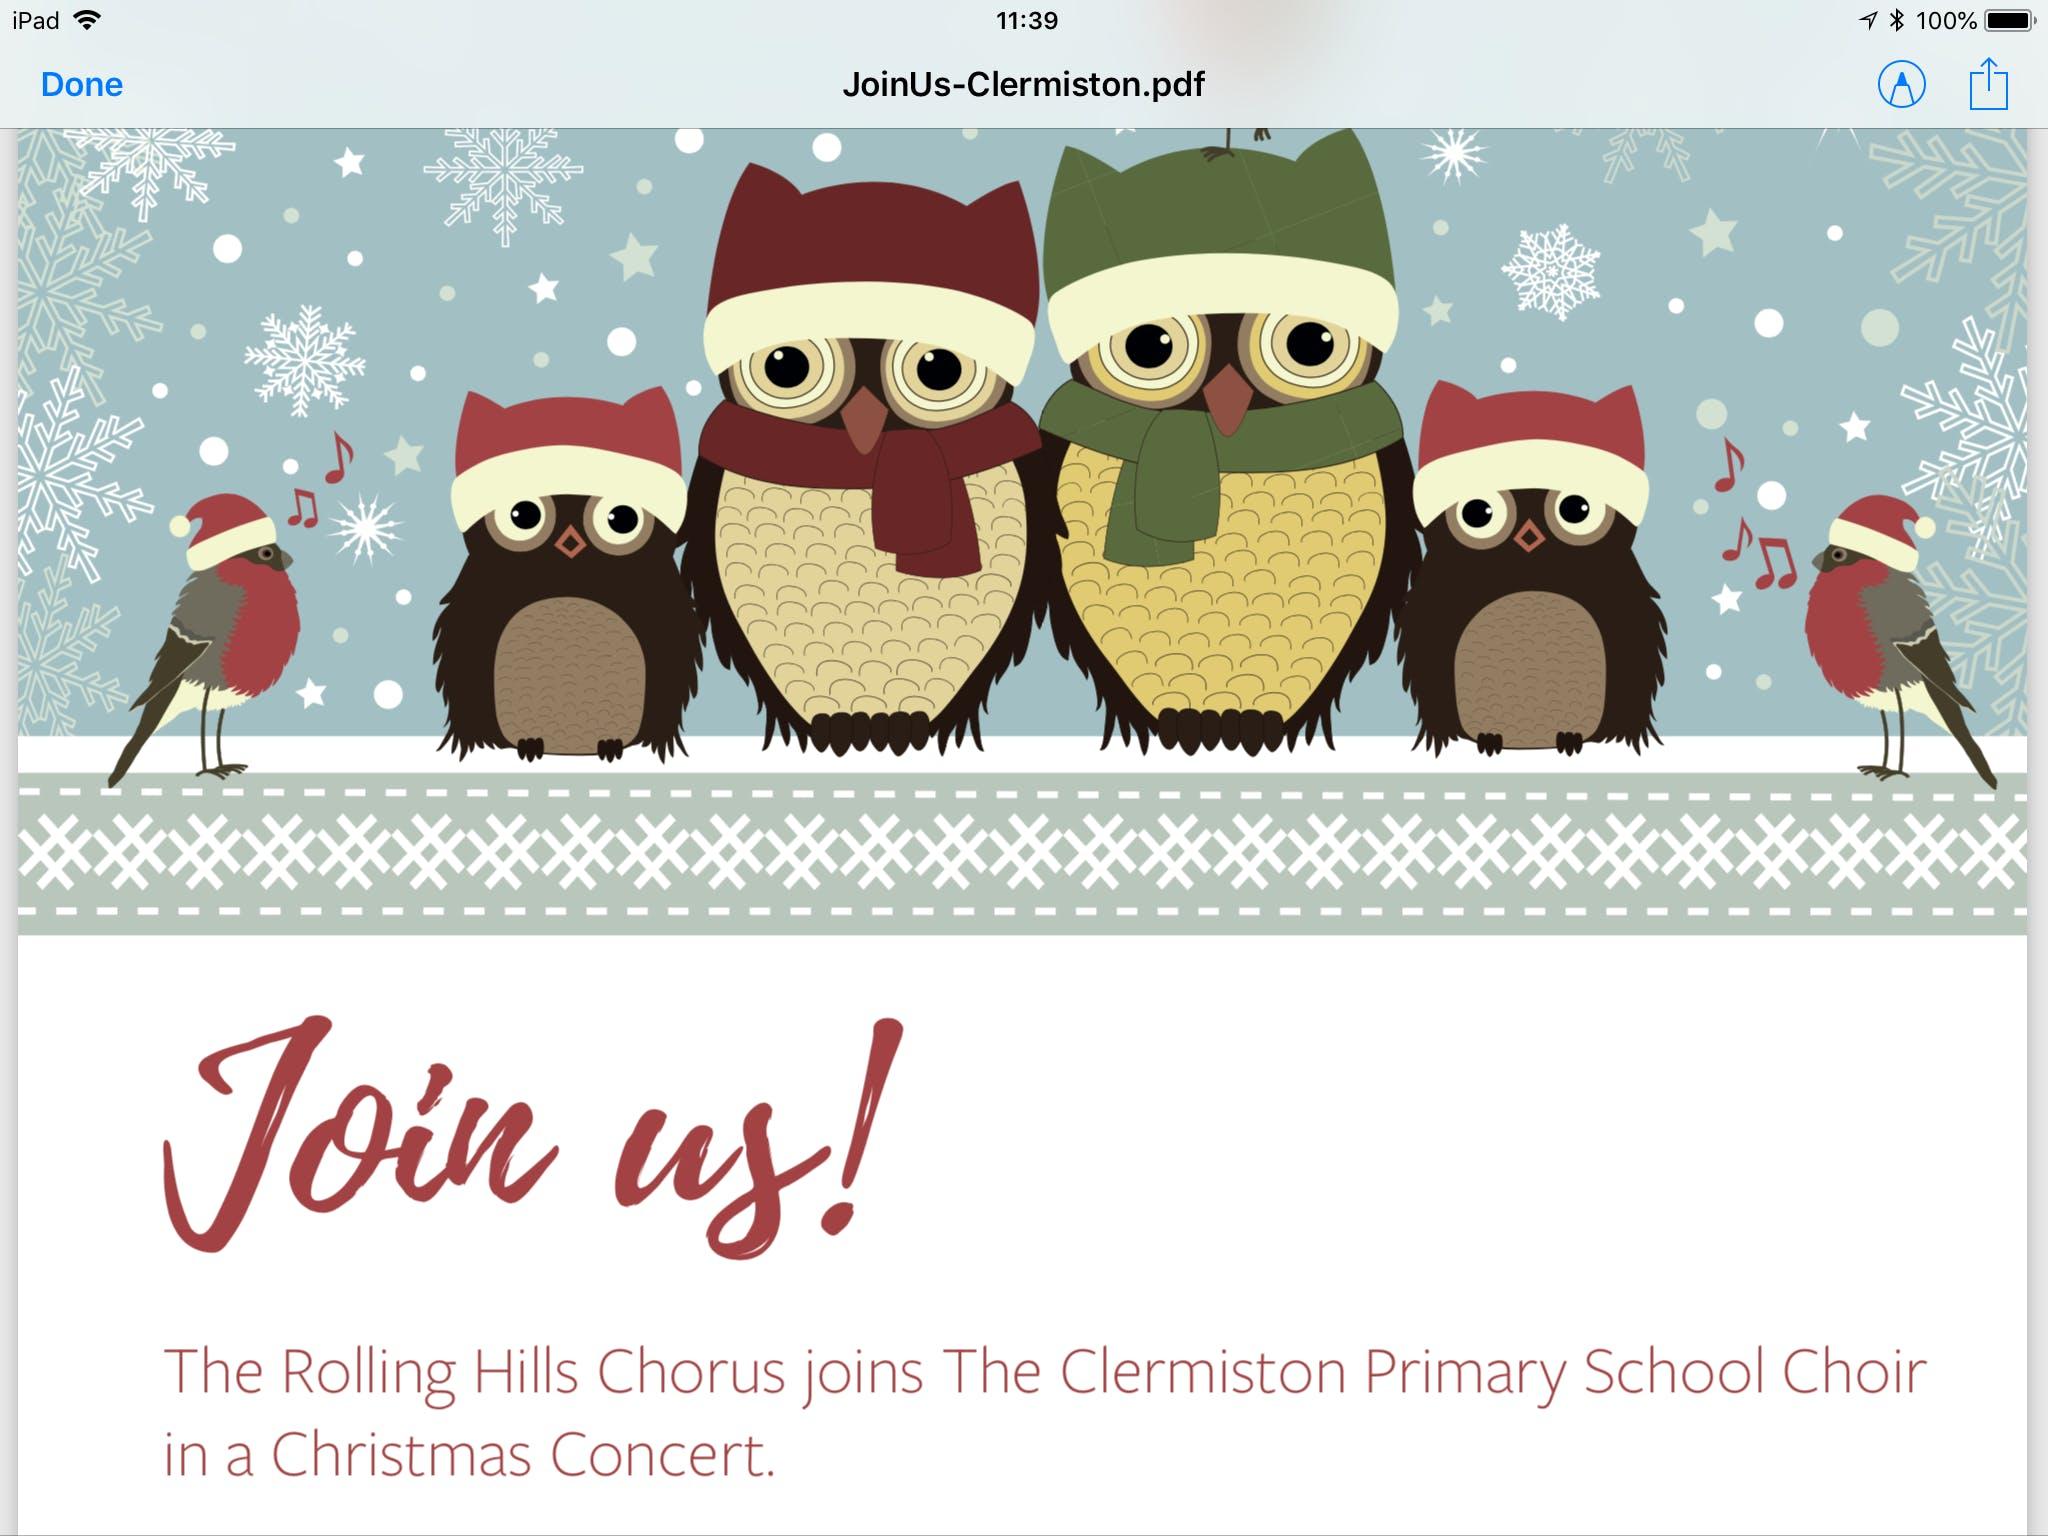 CLERMISTON'S CHRISTMAS CONCERT AT ST KENTIGER